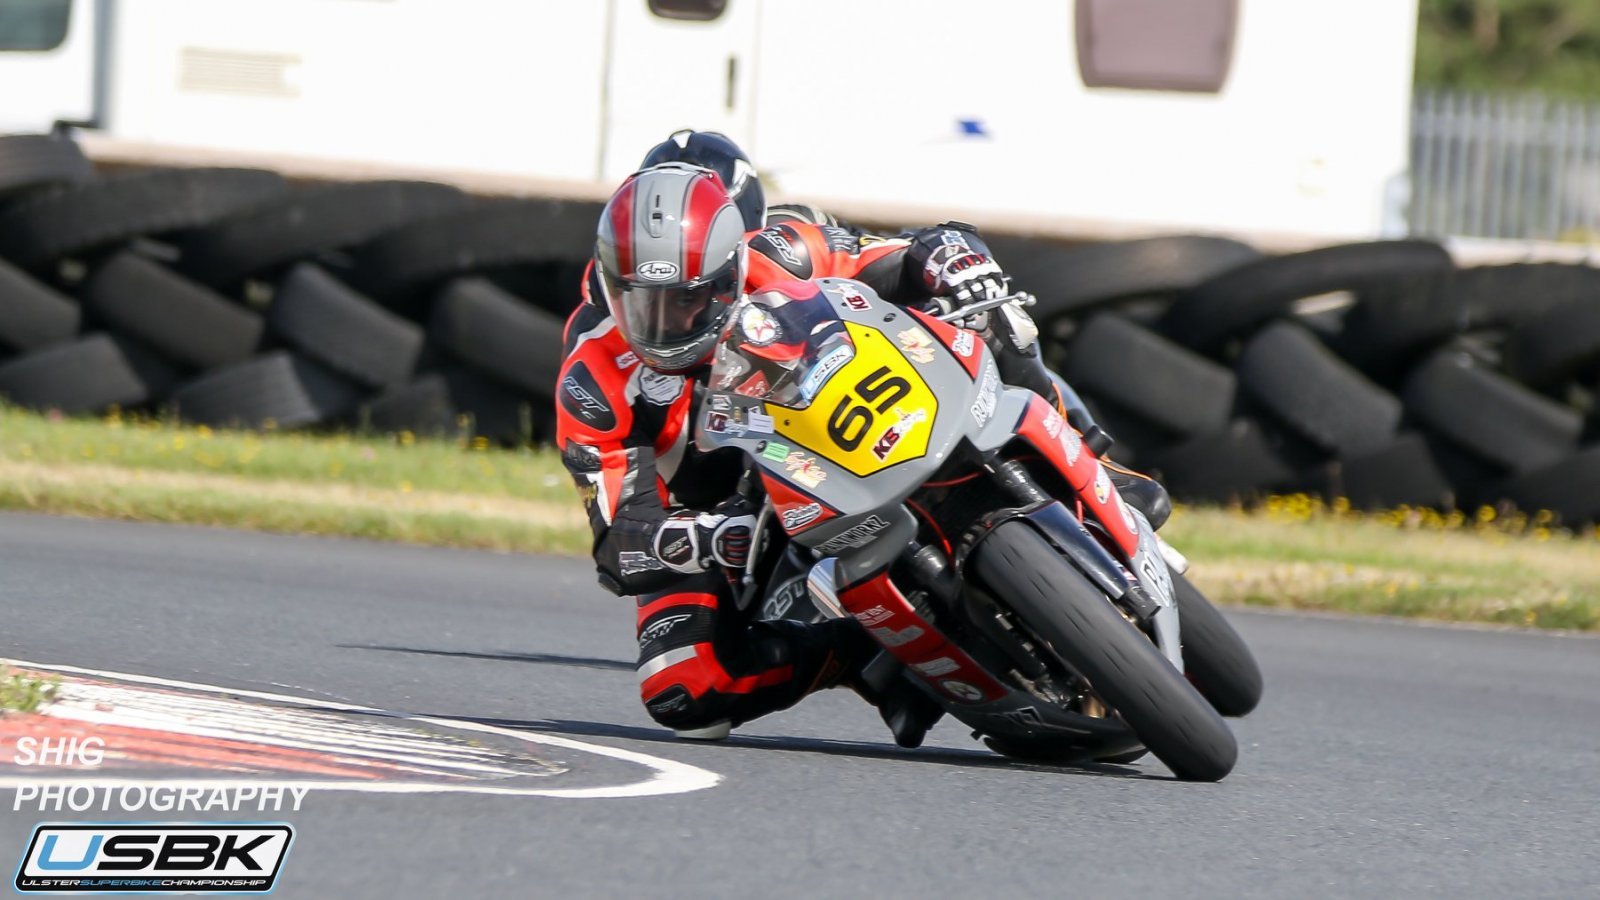 Sv650 Race Bike Rms Motoring Forum